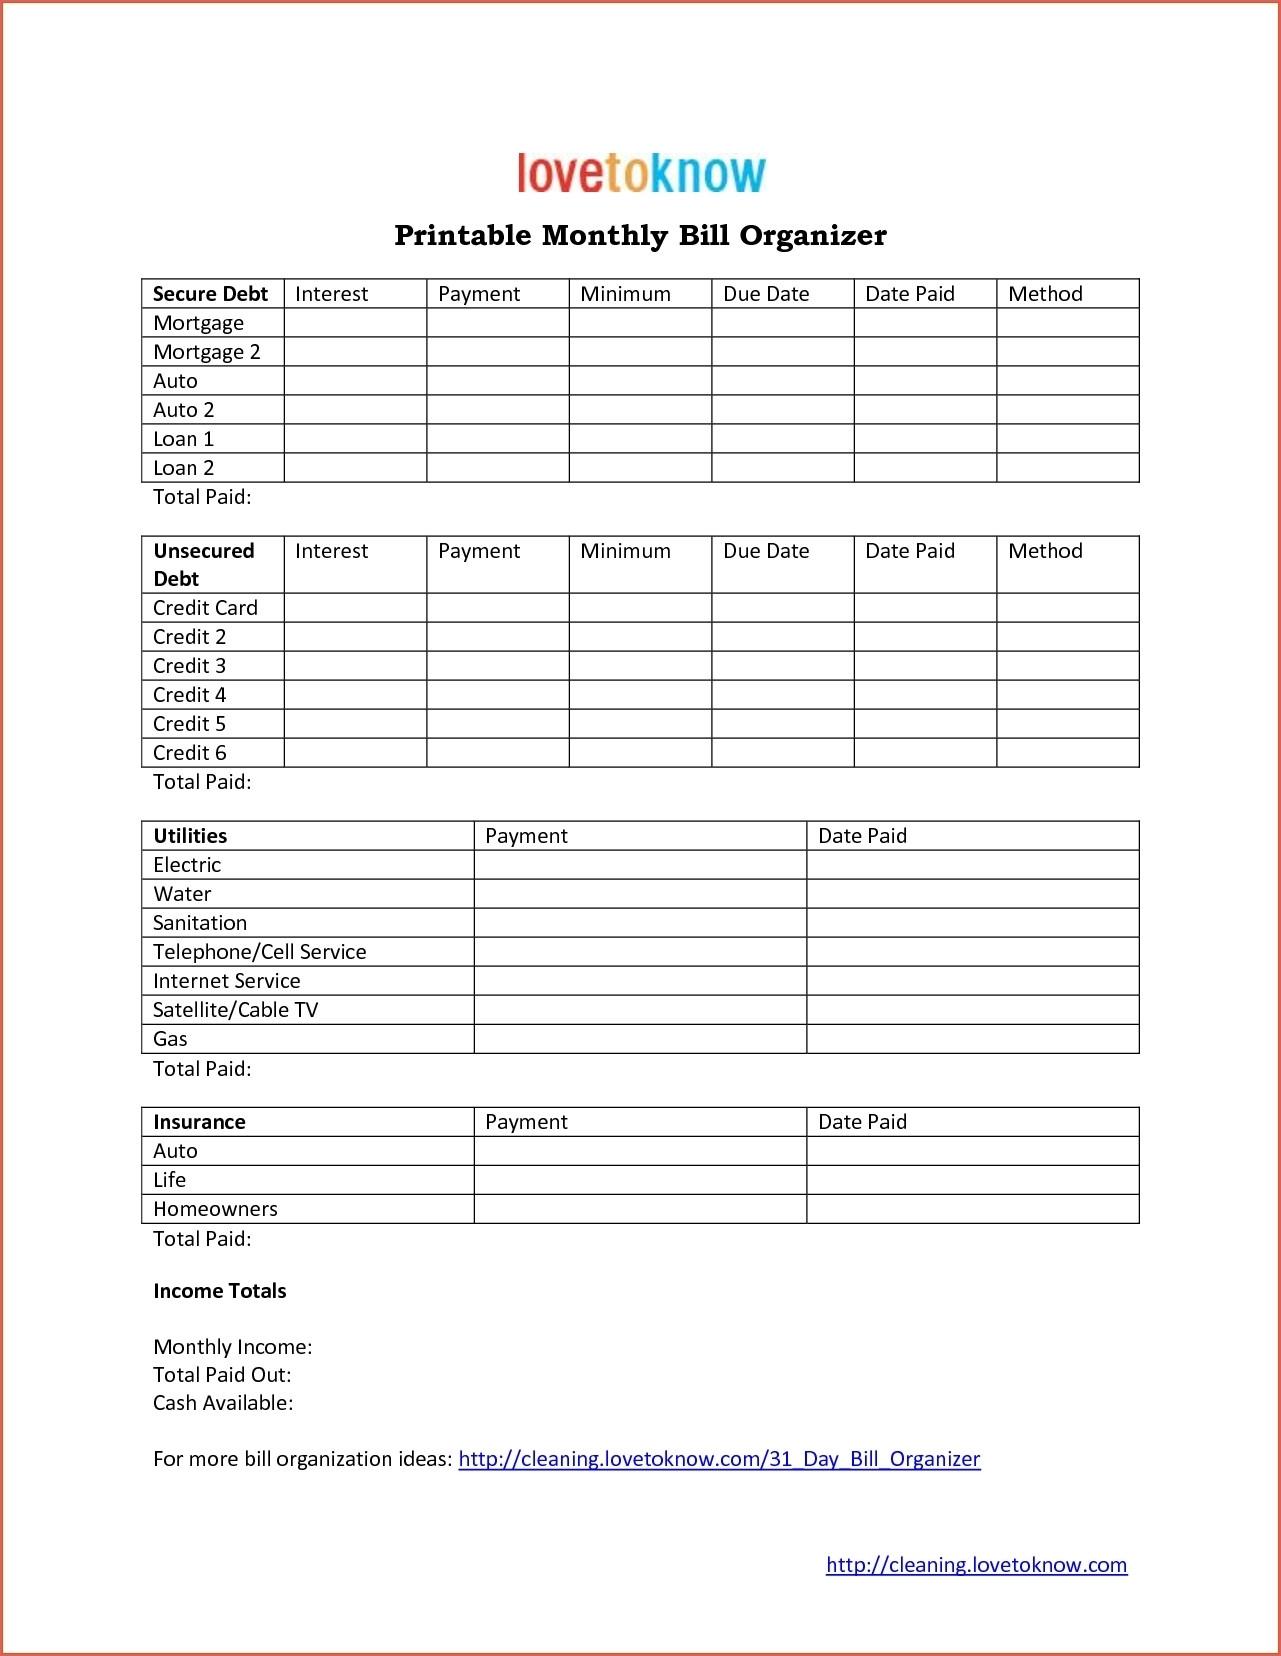 Printable Monthly Bill Calendar Bills Organizer Template Online with Monthly Bill Calendar Template Printable